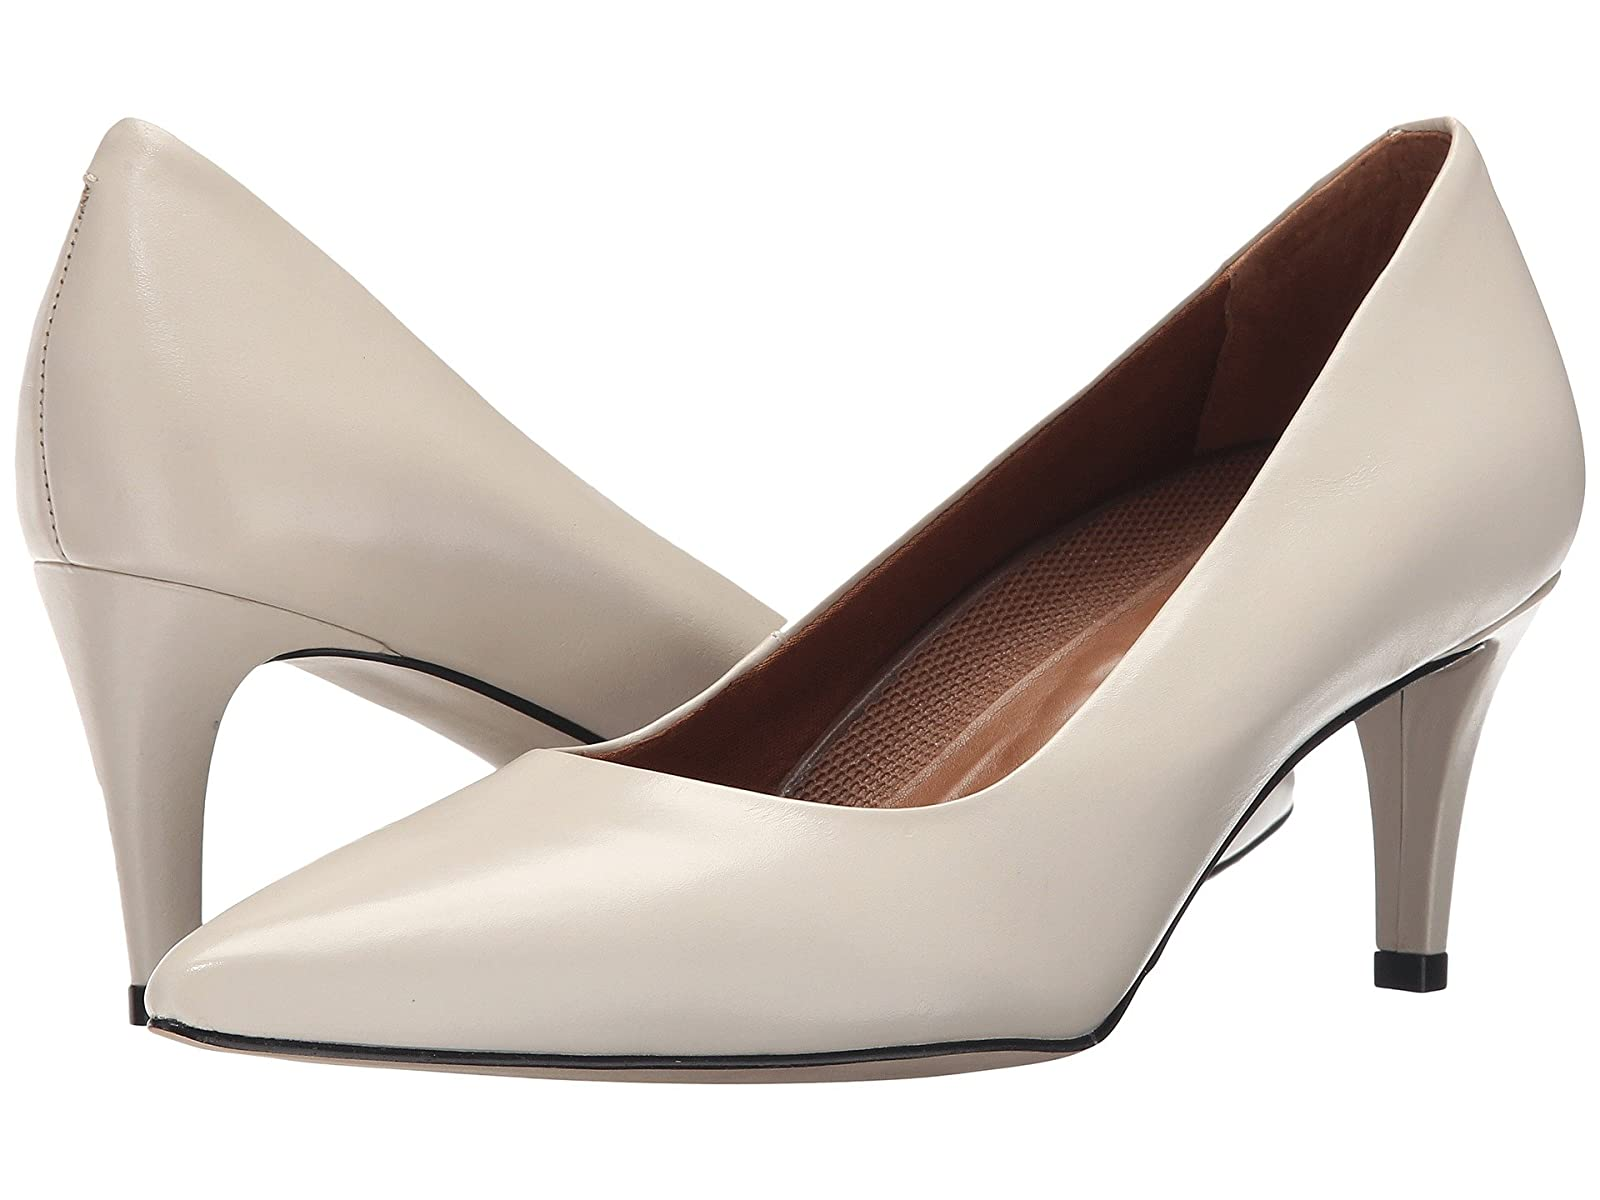 Walking Cradles SophiaCheap and distinctive eye-catching shoes